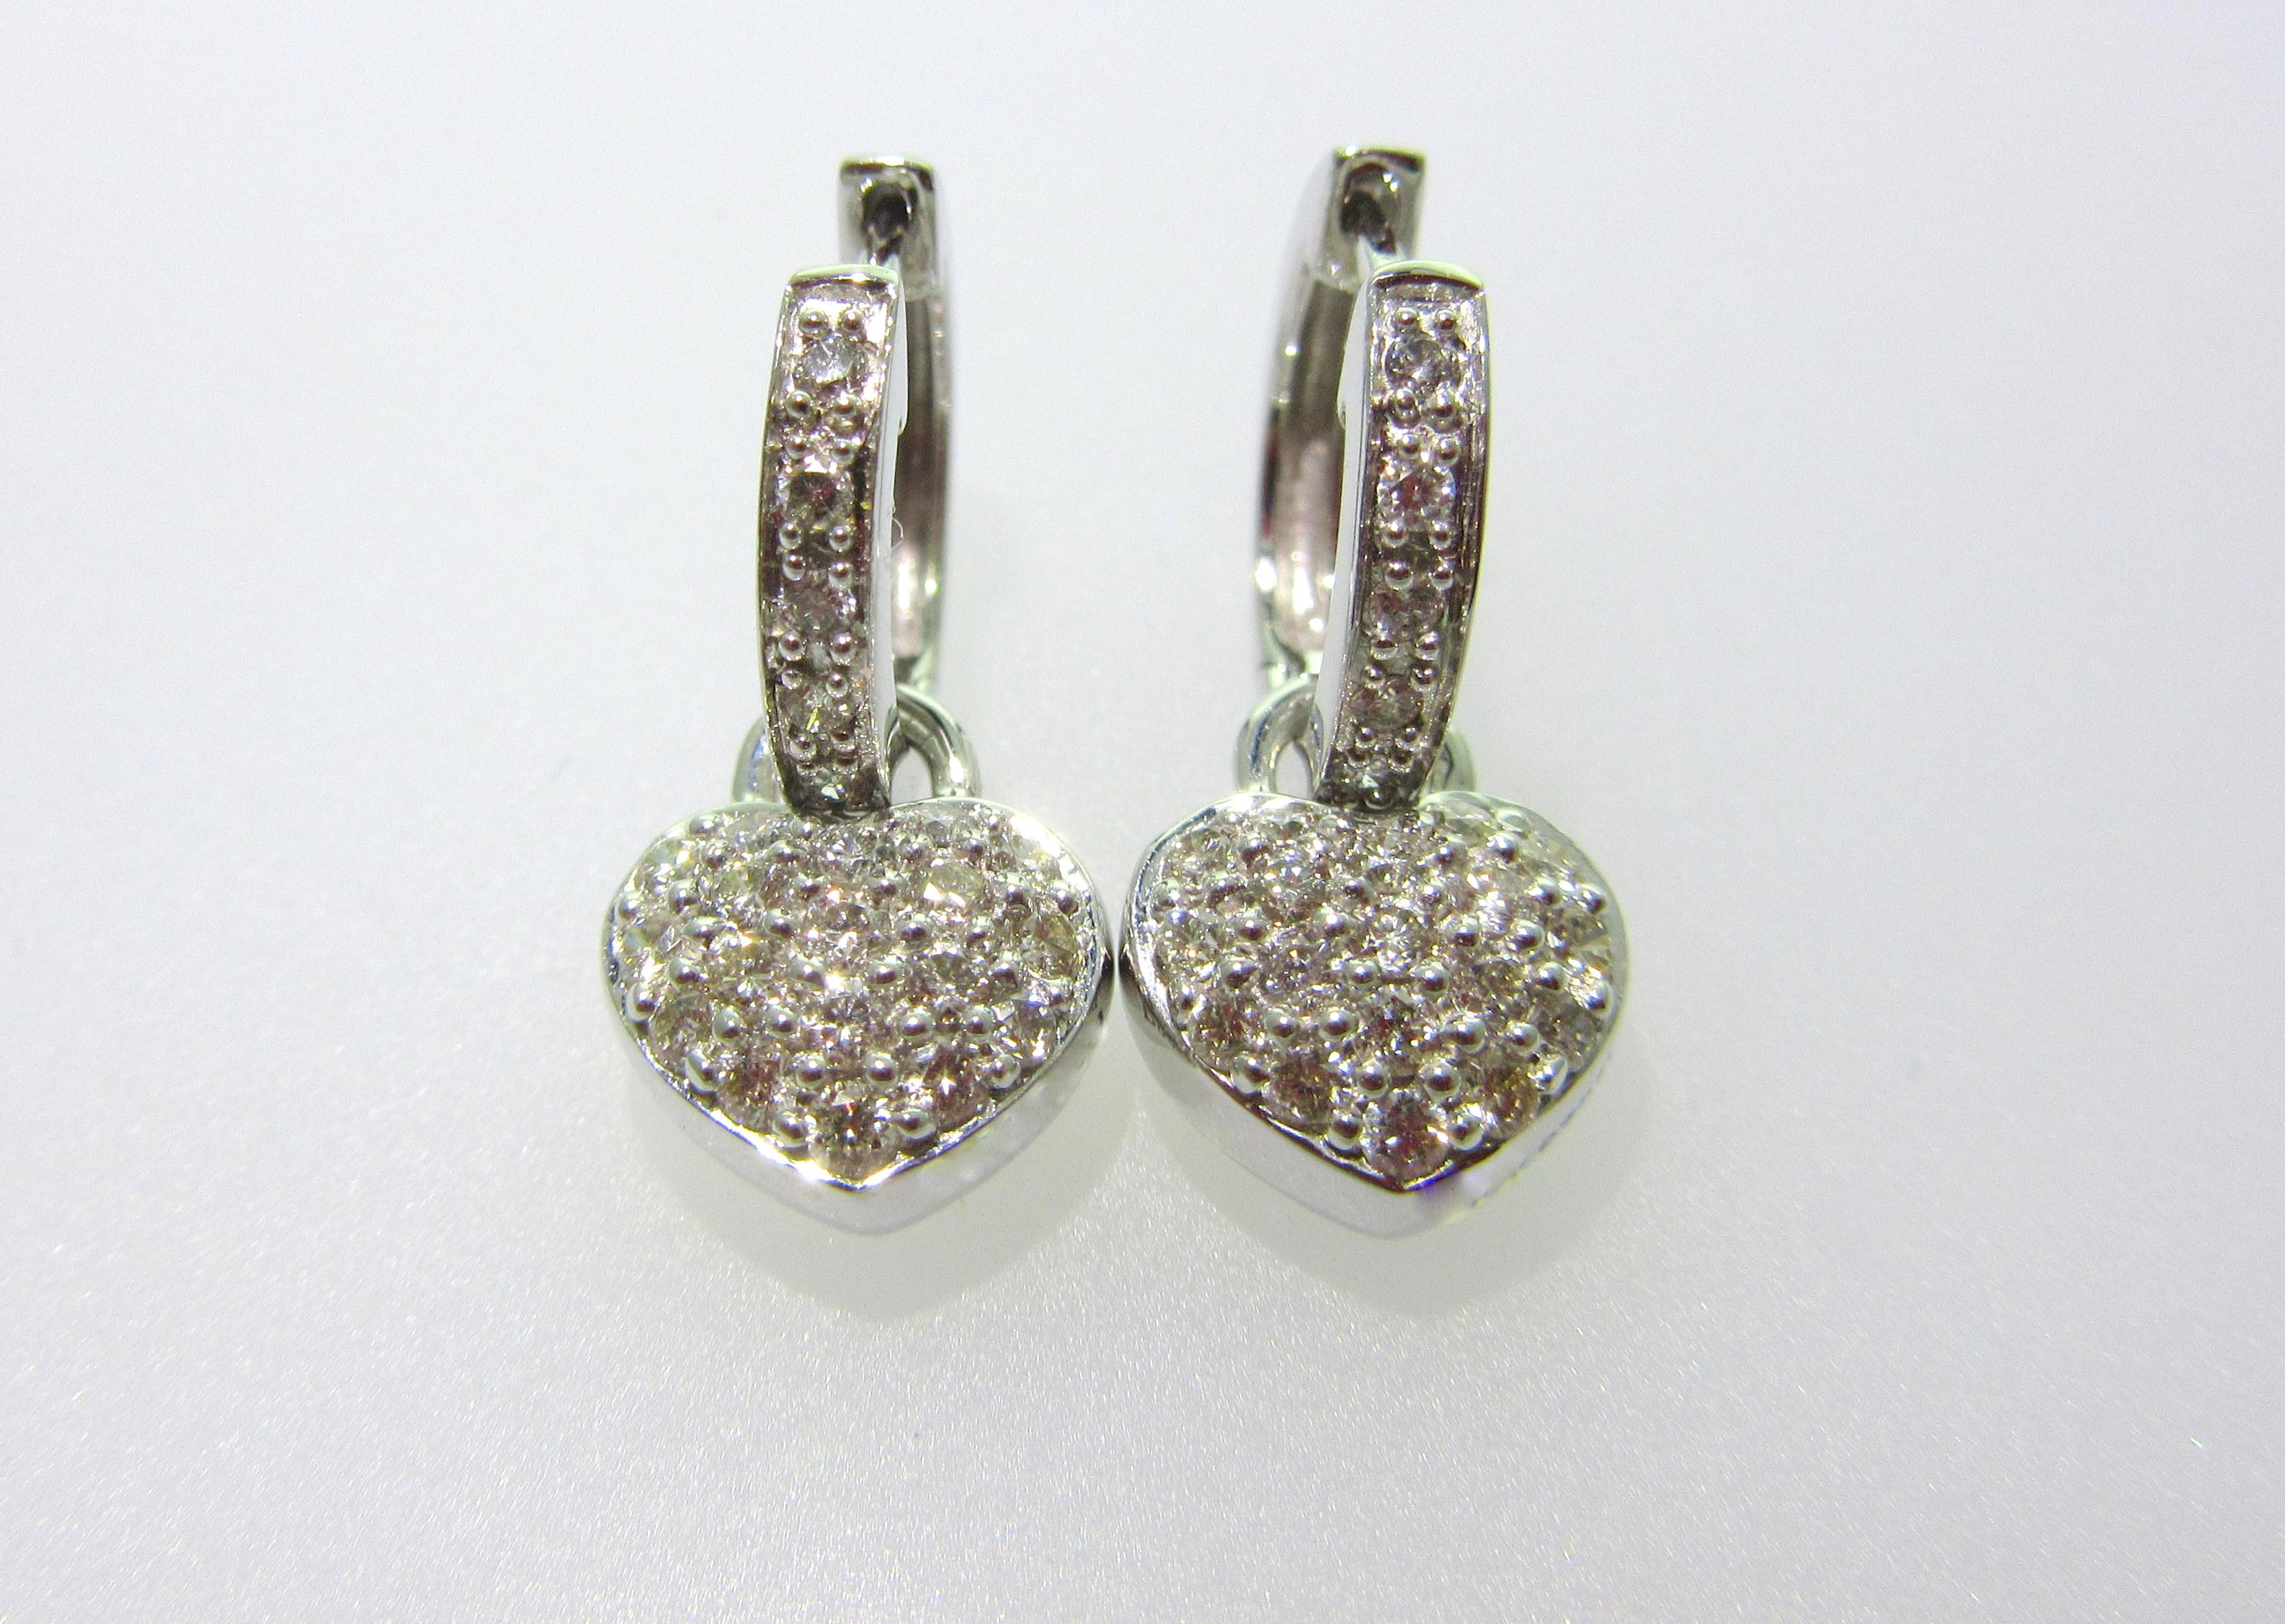 Heart Charm Diamond Earrings